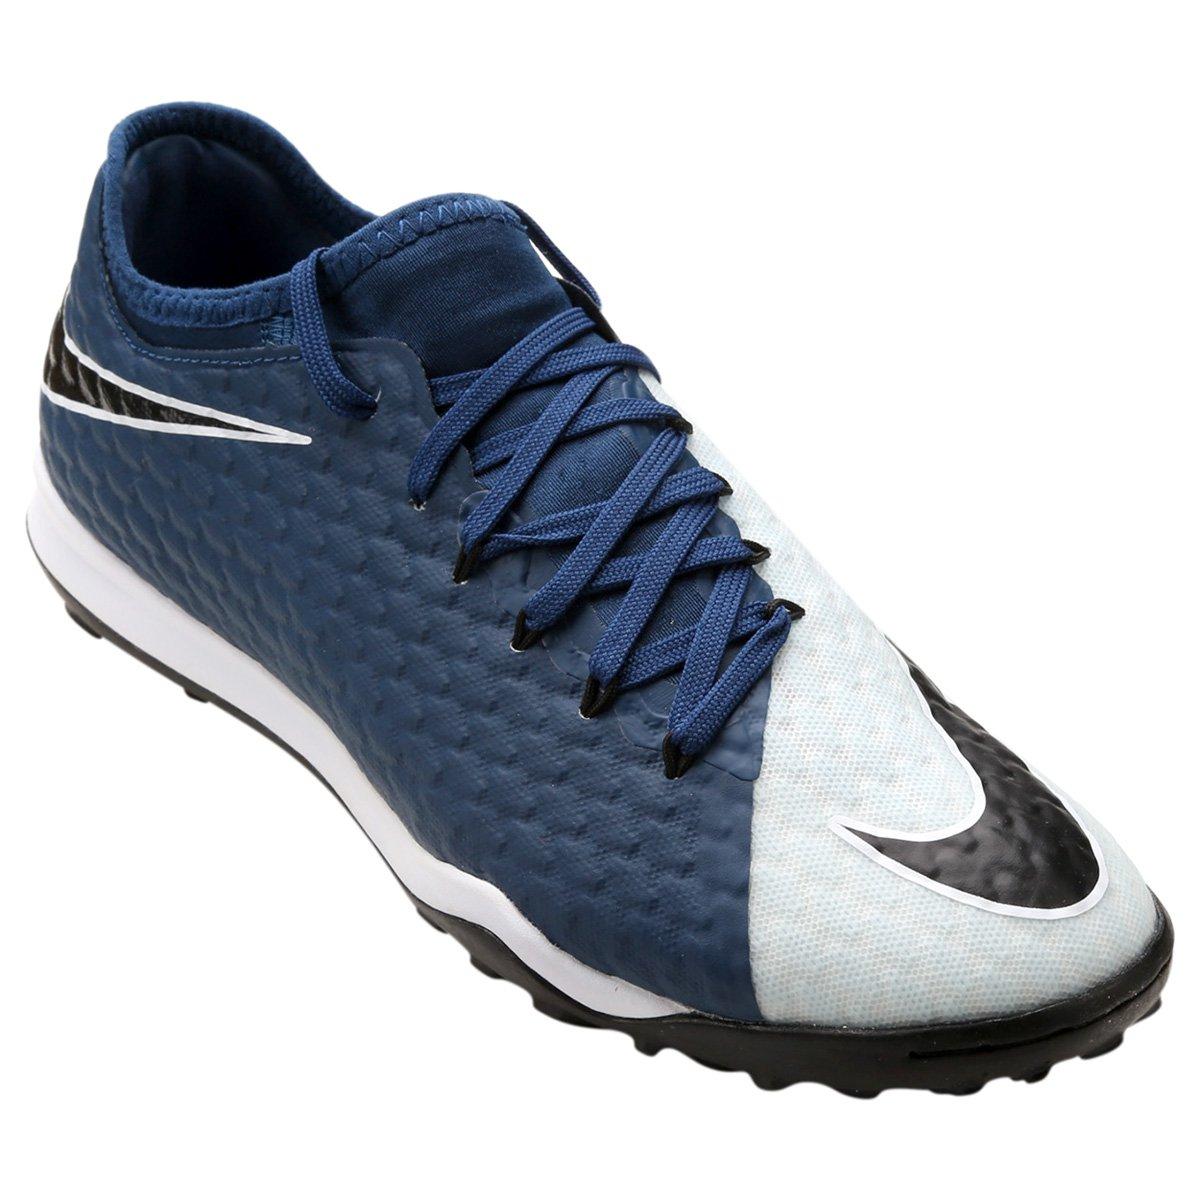 more photos 4b8a8 7a403 Chuteira Society Nike Hypervenom Finale 2 TF - Compre Agora   Loja do Inter